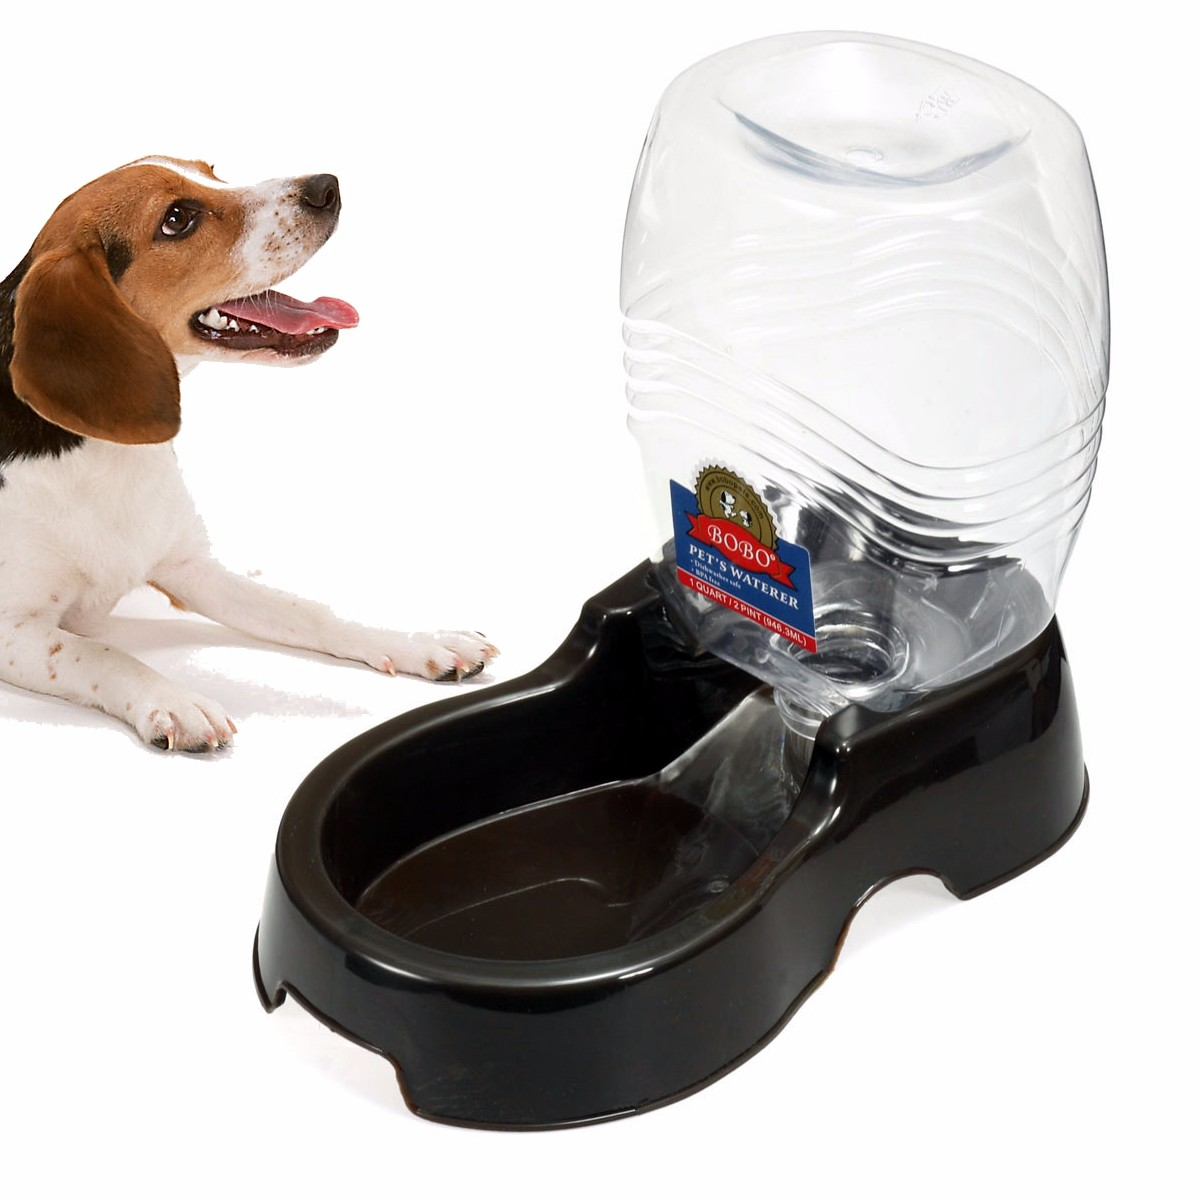 Dog Spa Reviews